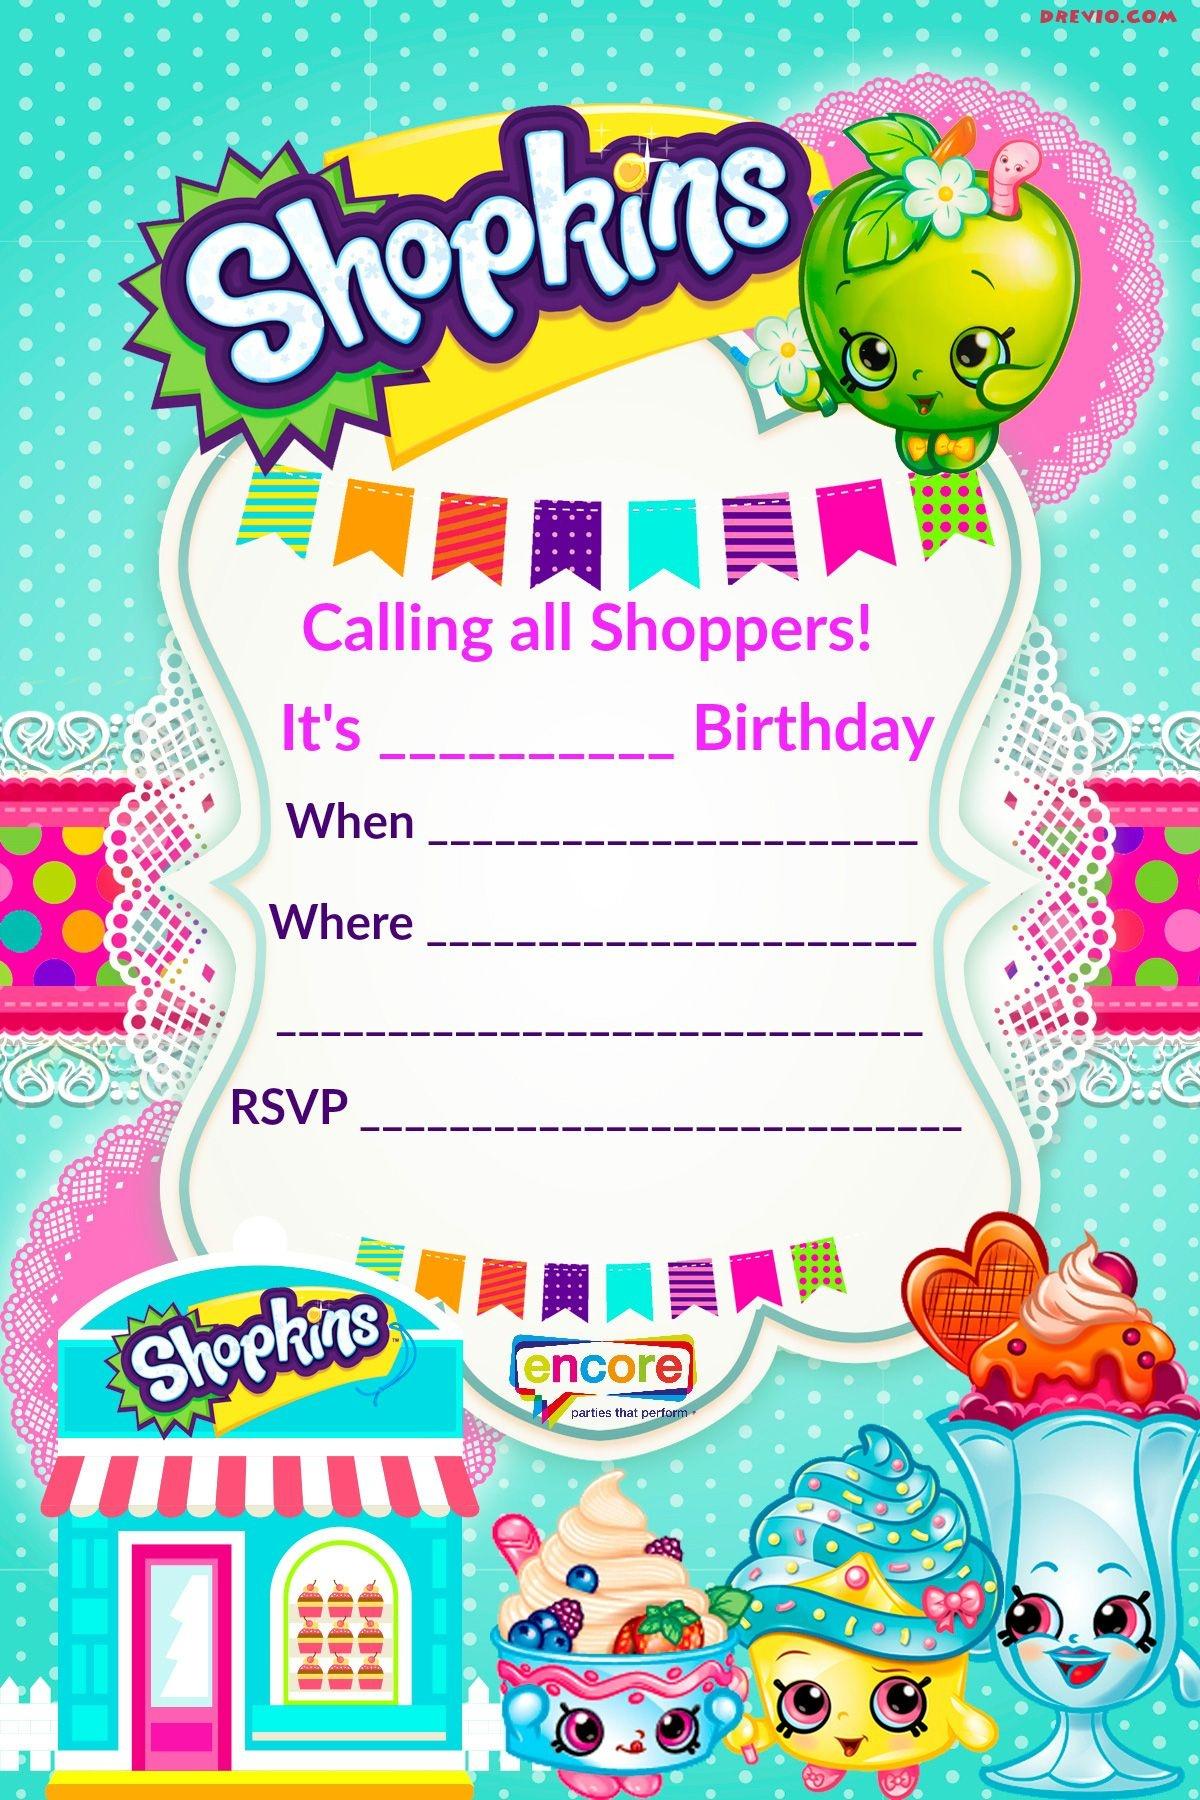 Updated - Free Printable Shopkins Birthday Invitation Template - Free Printable Birthday Invitation Templates